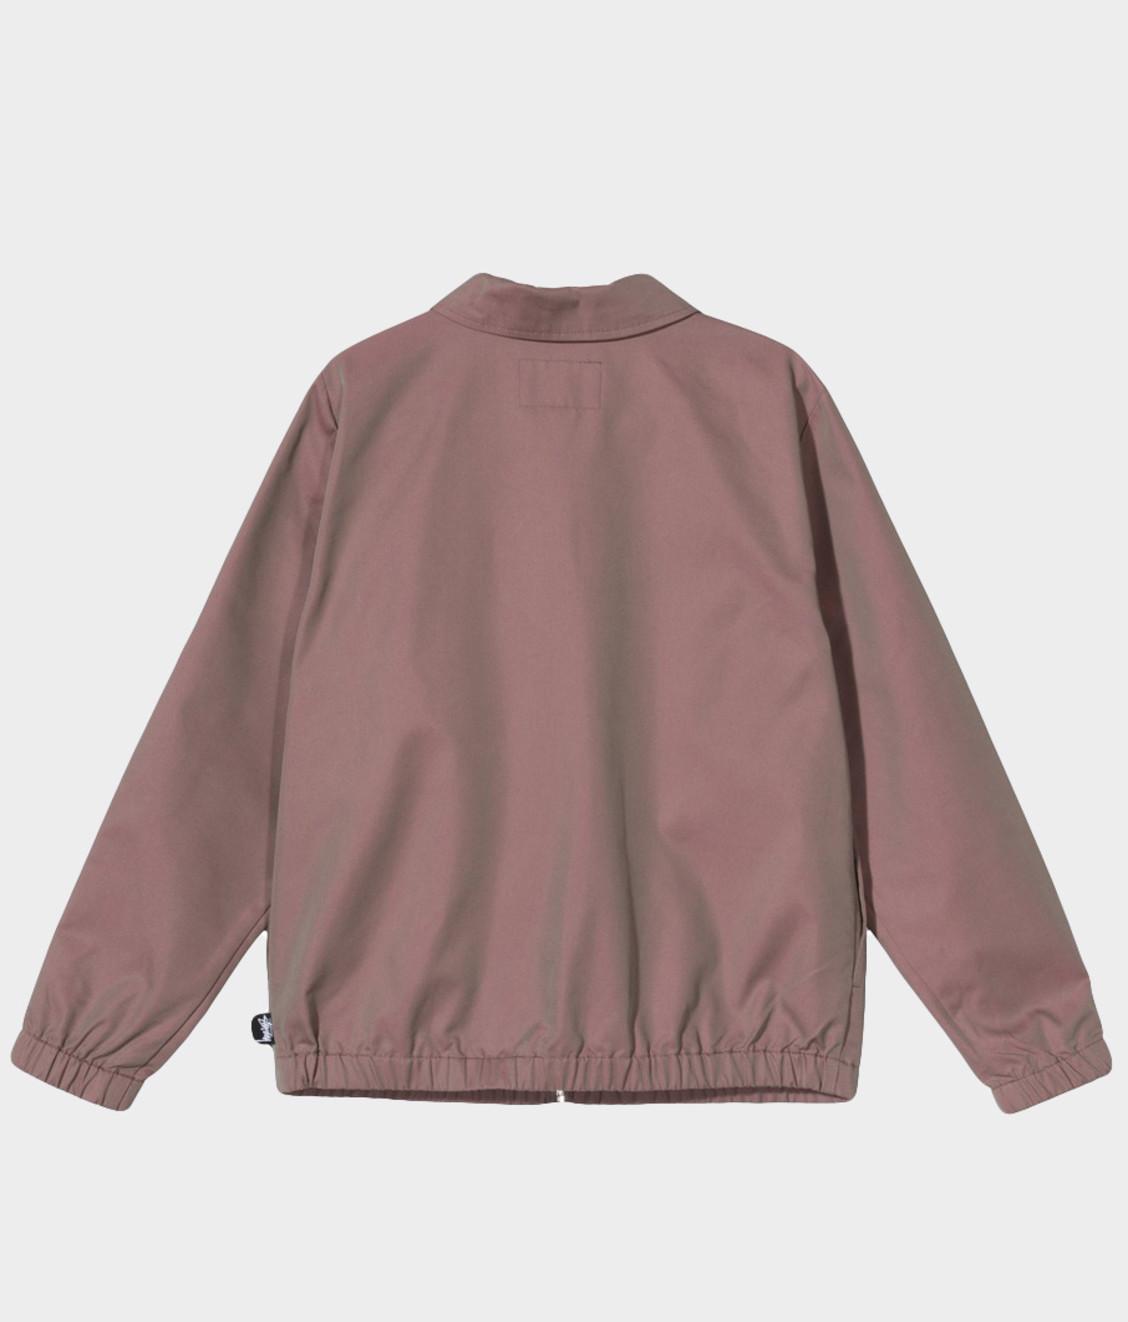 Stussy Stussy Iridescent Multi Pocket Jacket Red